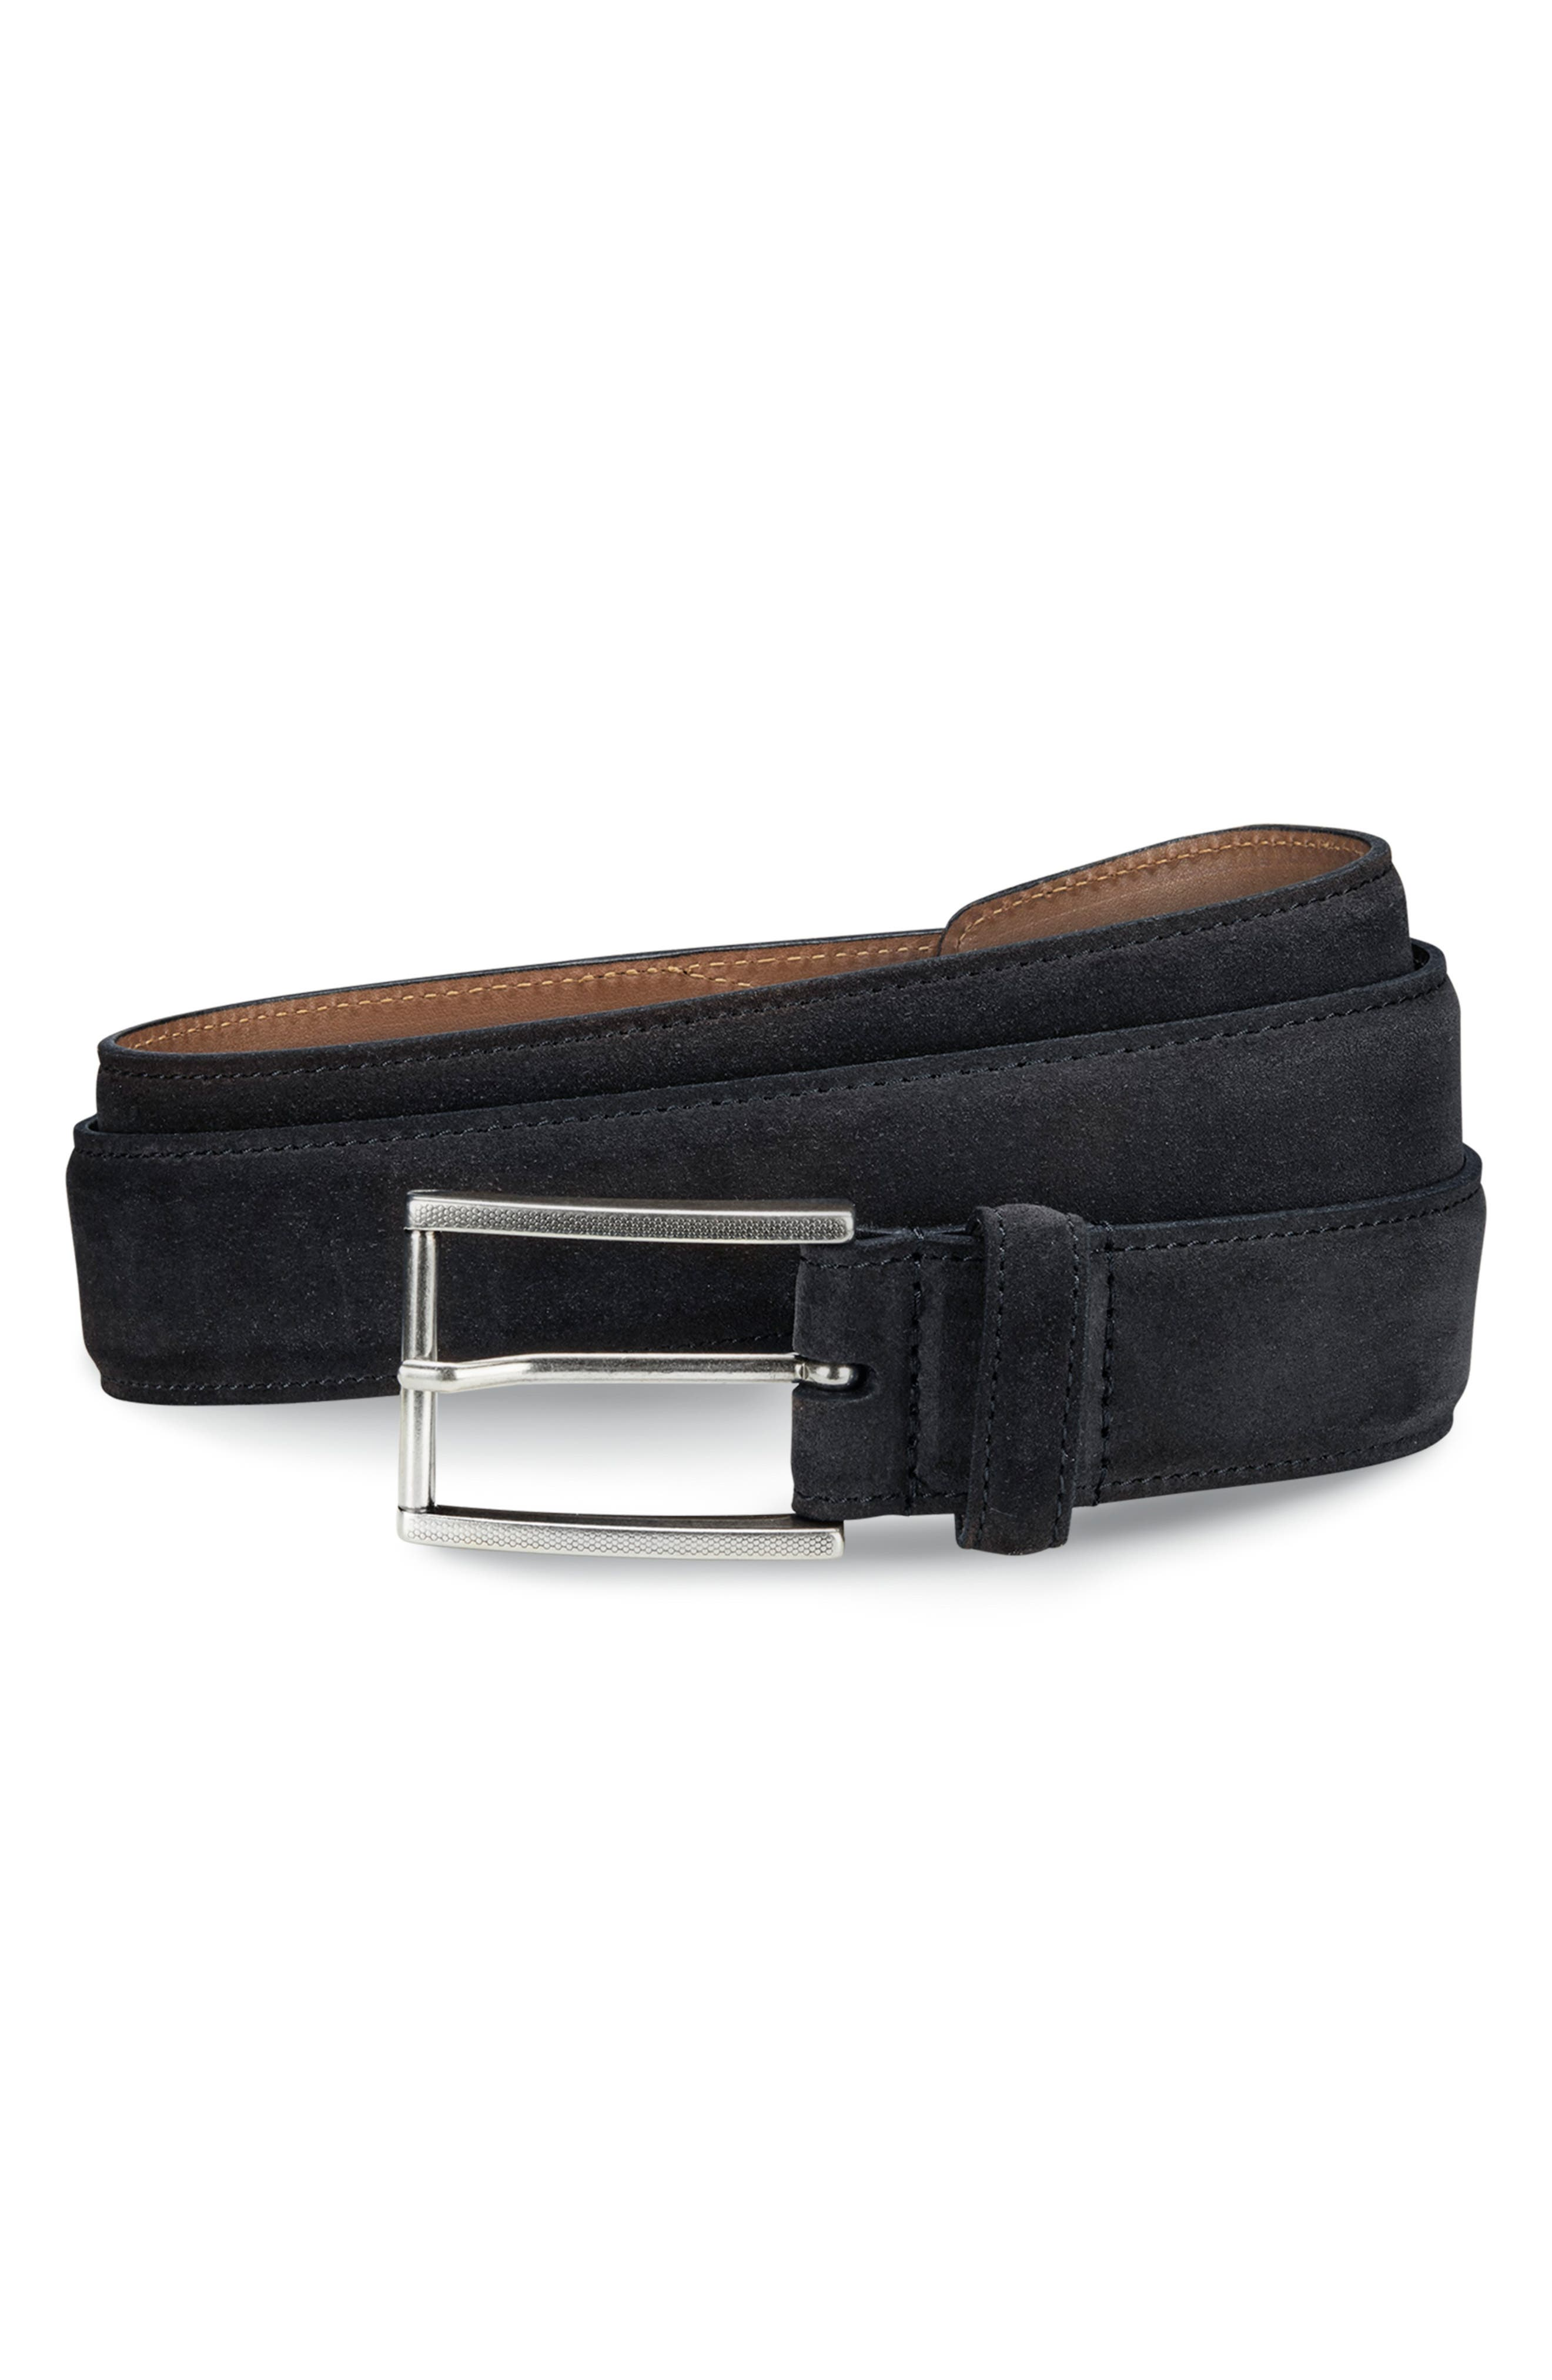 ALLEN EDMONDS Suede Avenue Leather Belt, Main, color, BLACK SUEDE